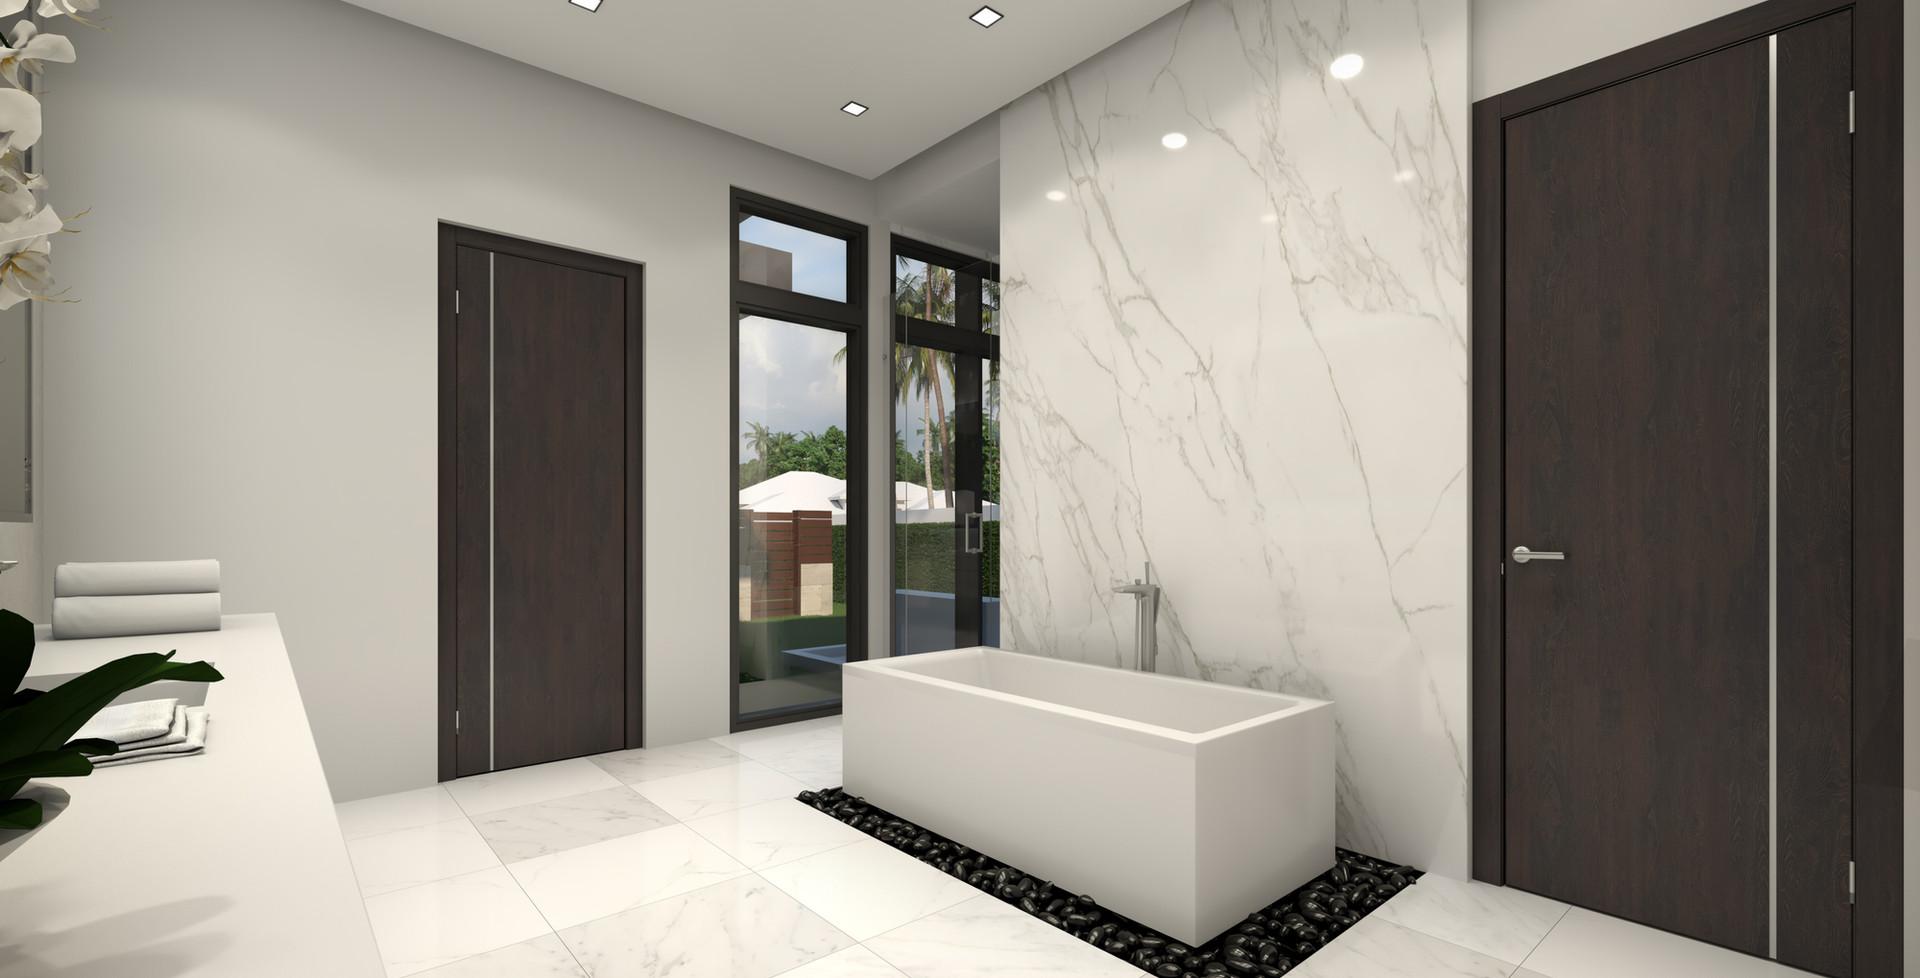 Int - Bath_2.jpg